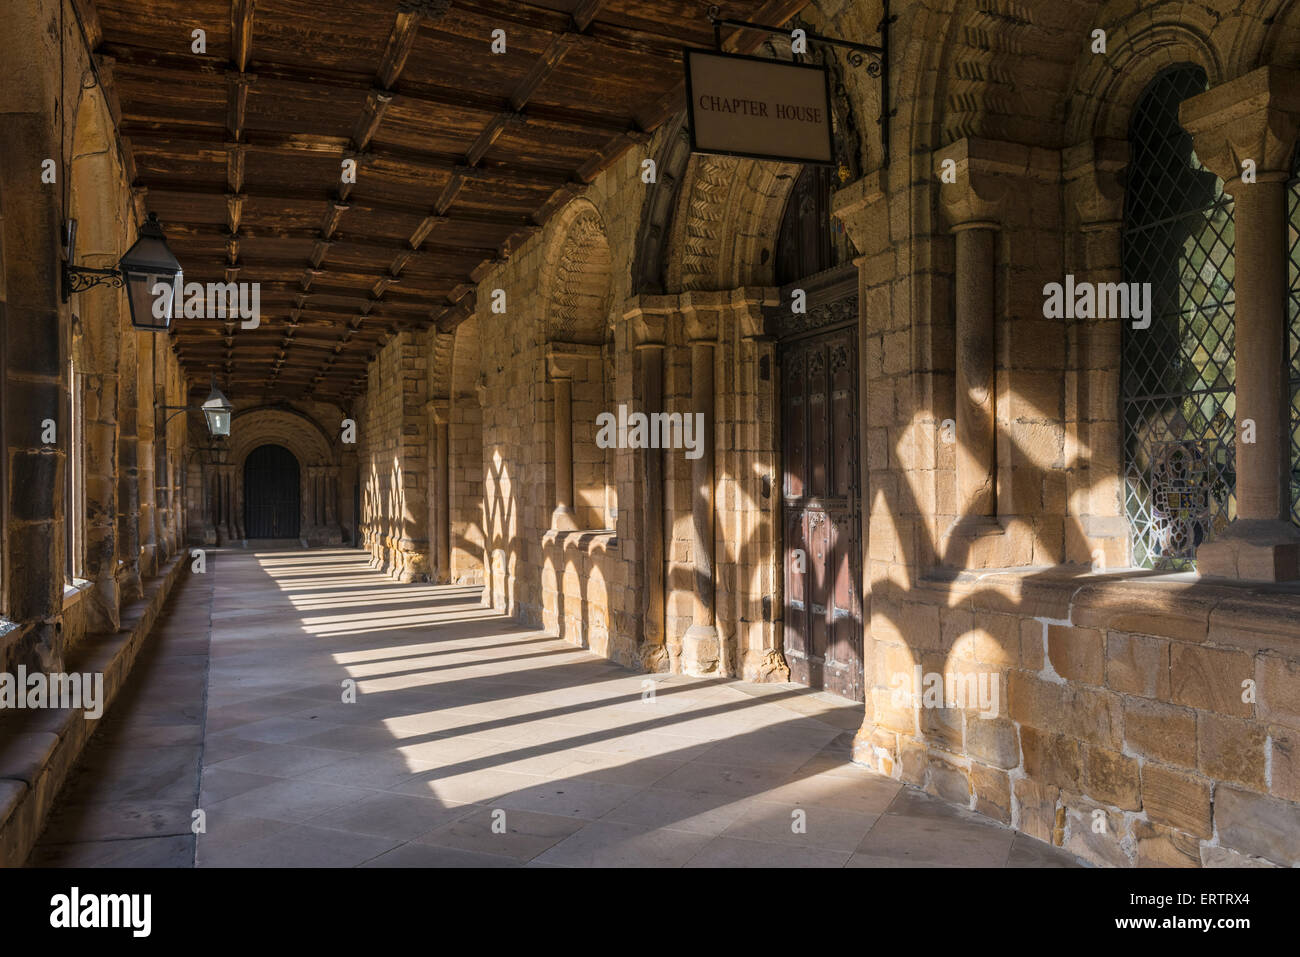 Cloister at Durham Cathedral, Durham, England, UK - Stock Image